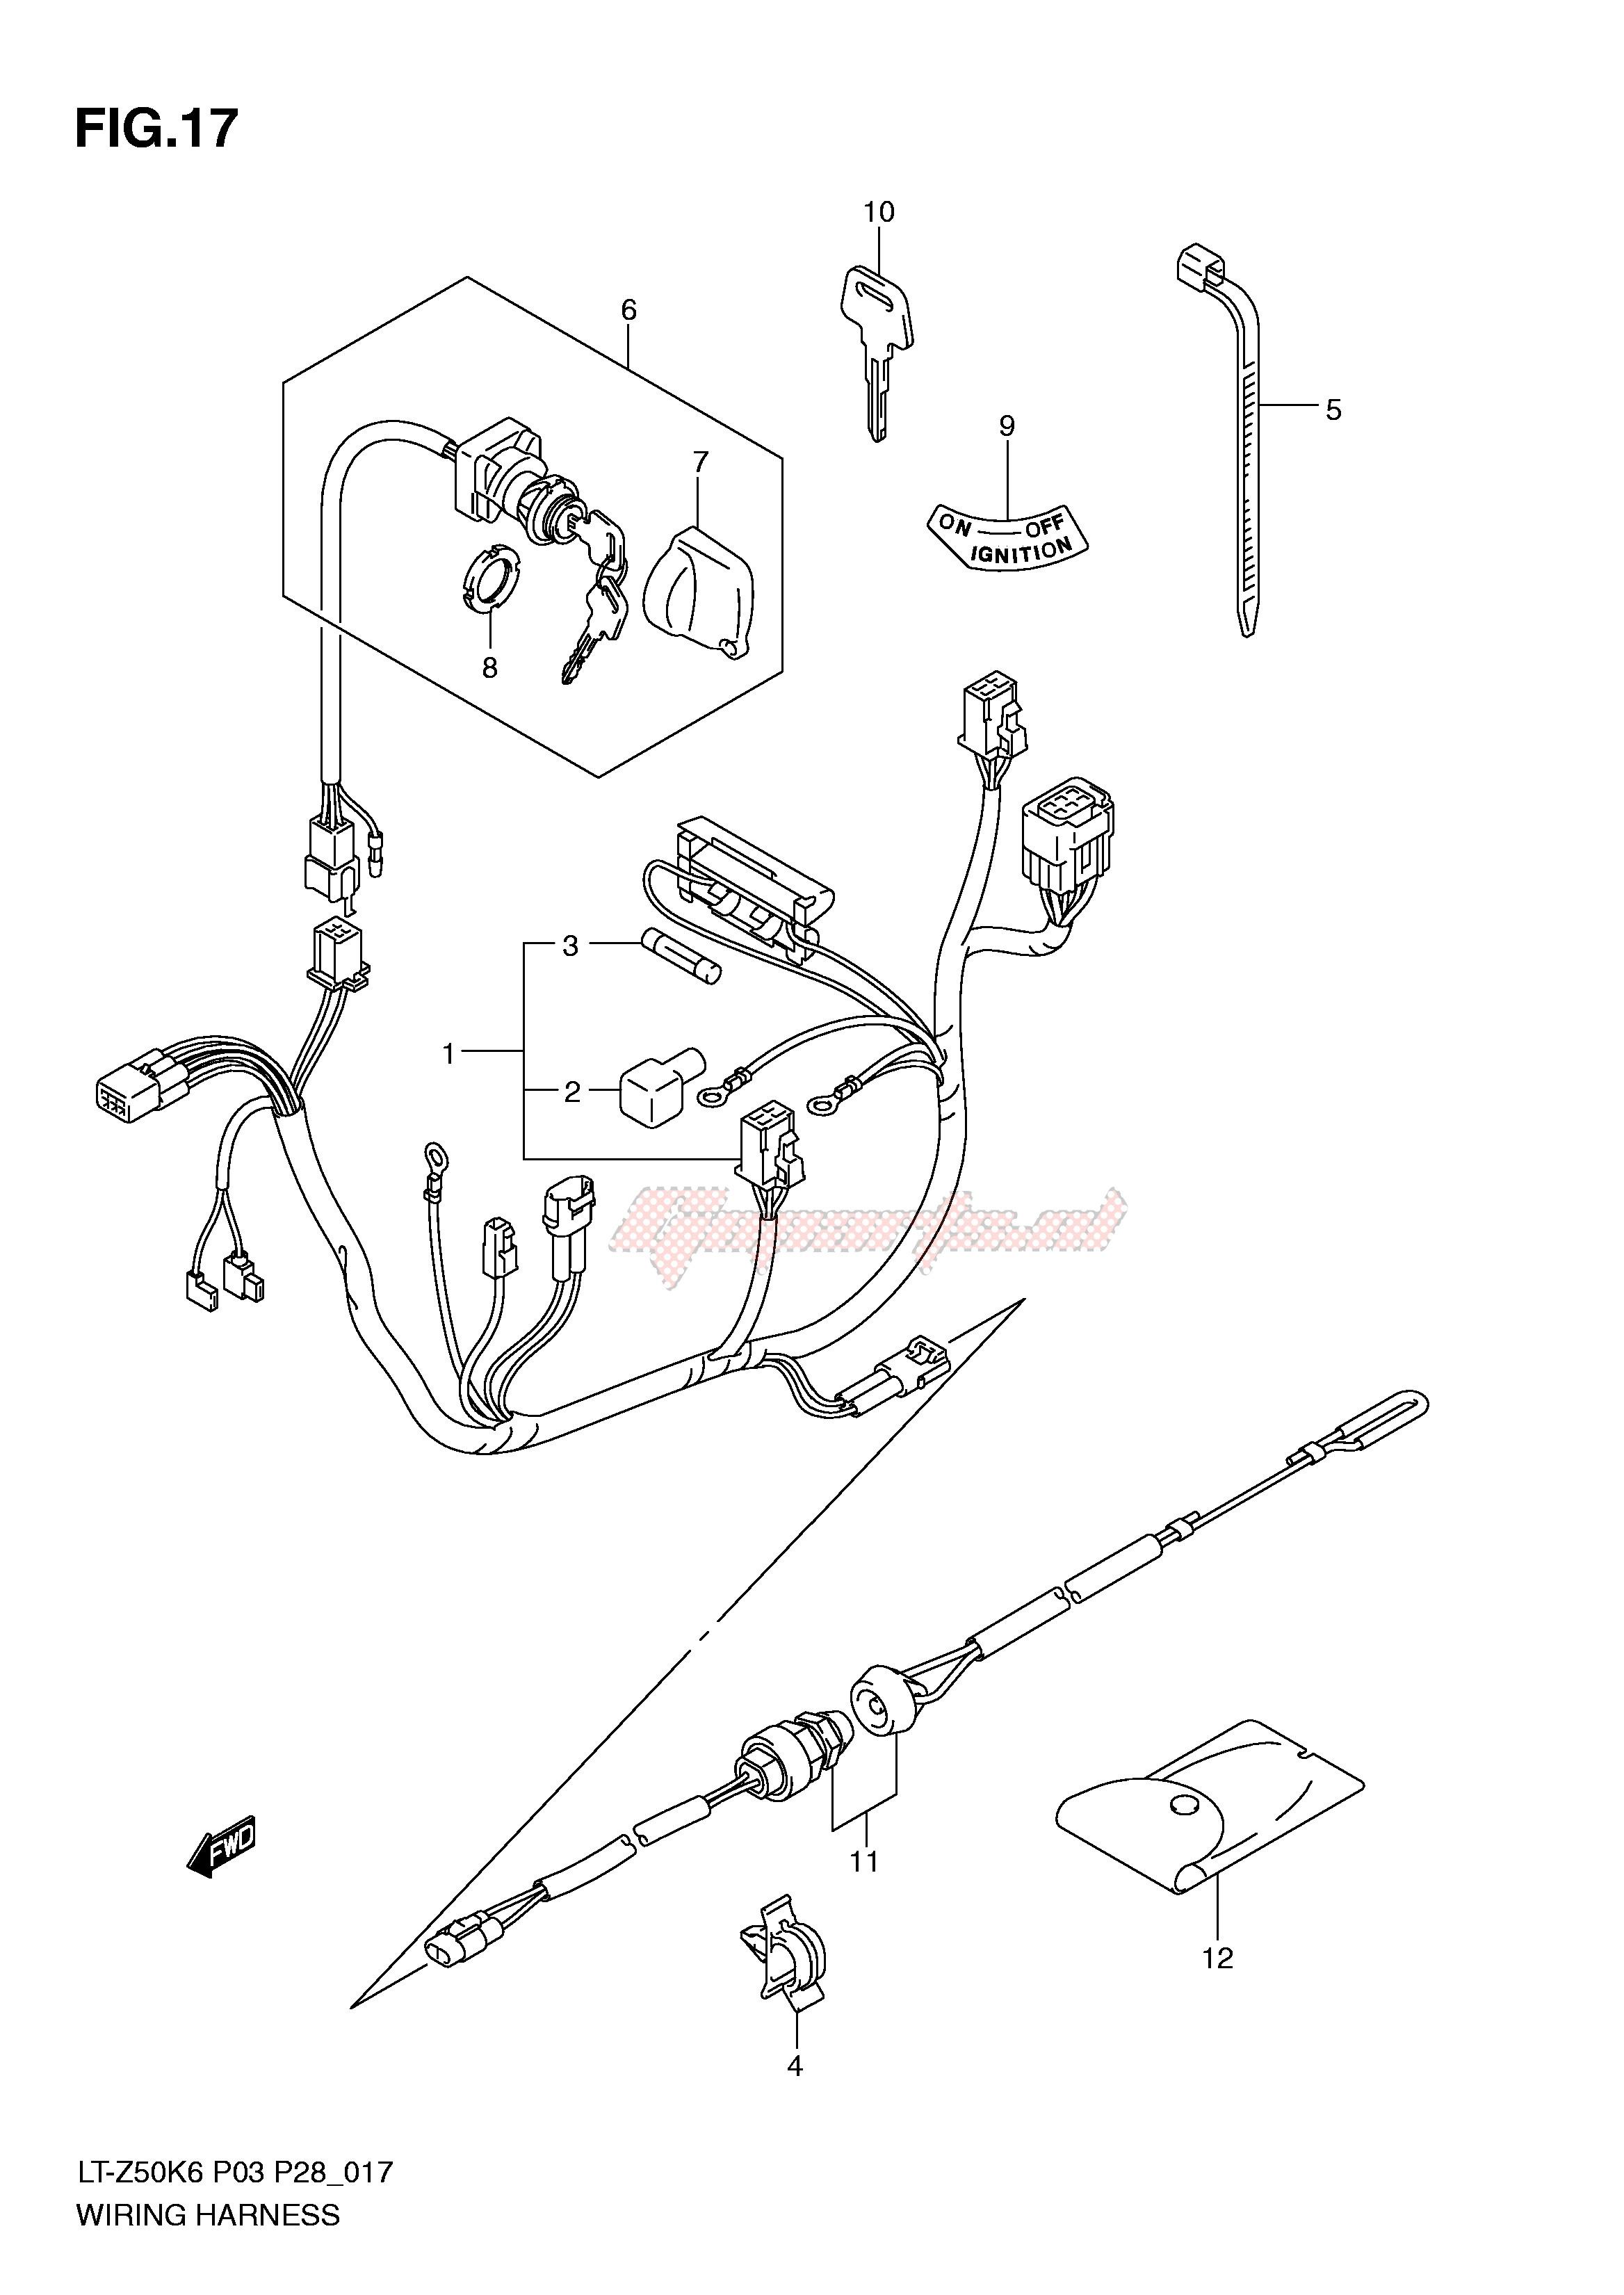 OEM parts Suzuki [All terrain] LT-Z50 (P3-P28) / 2007